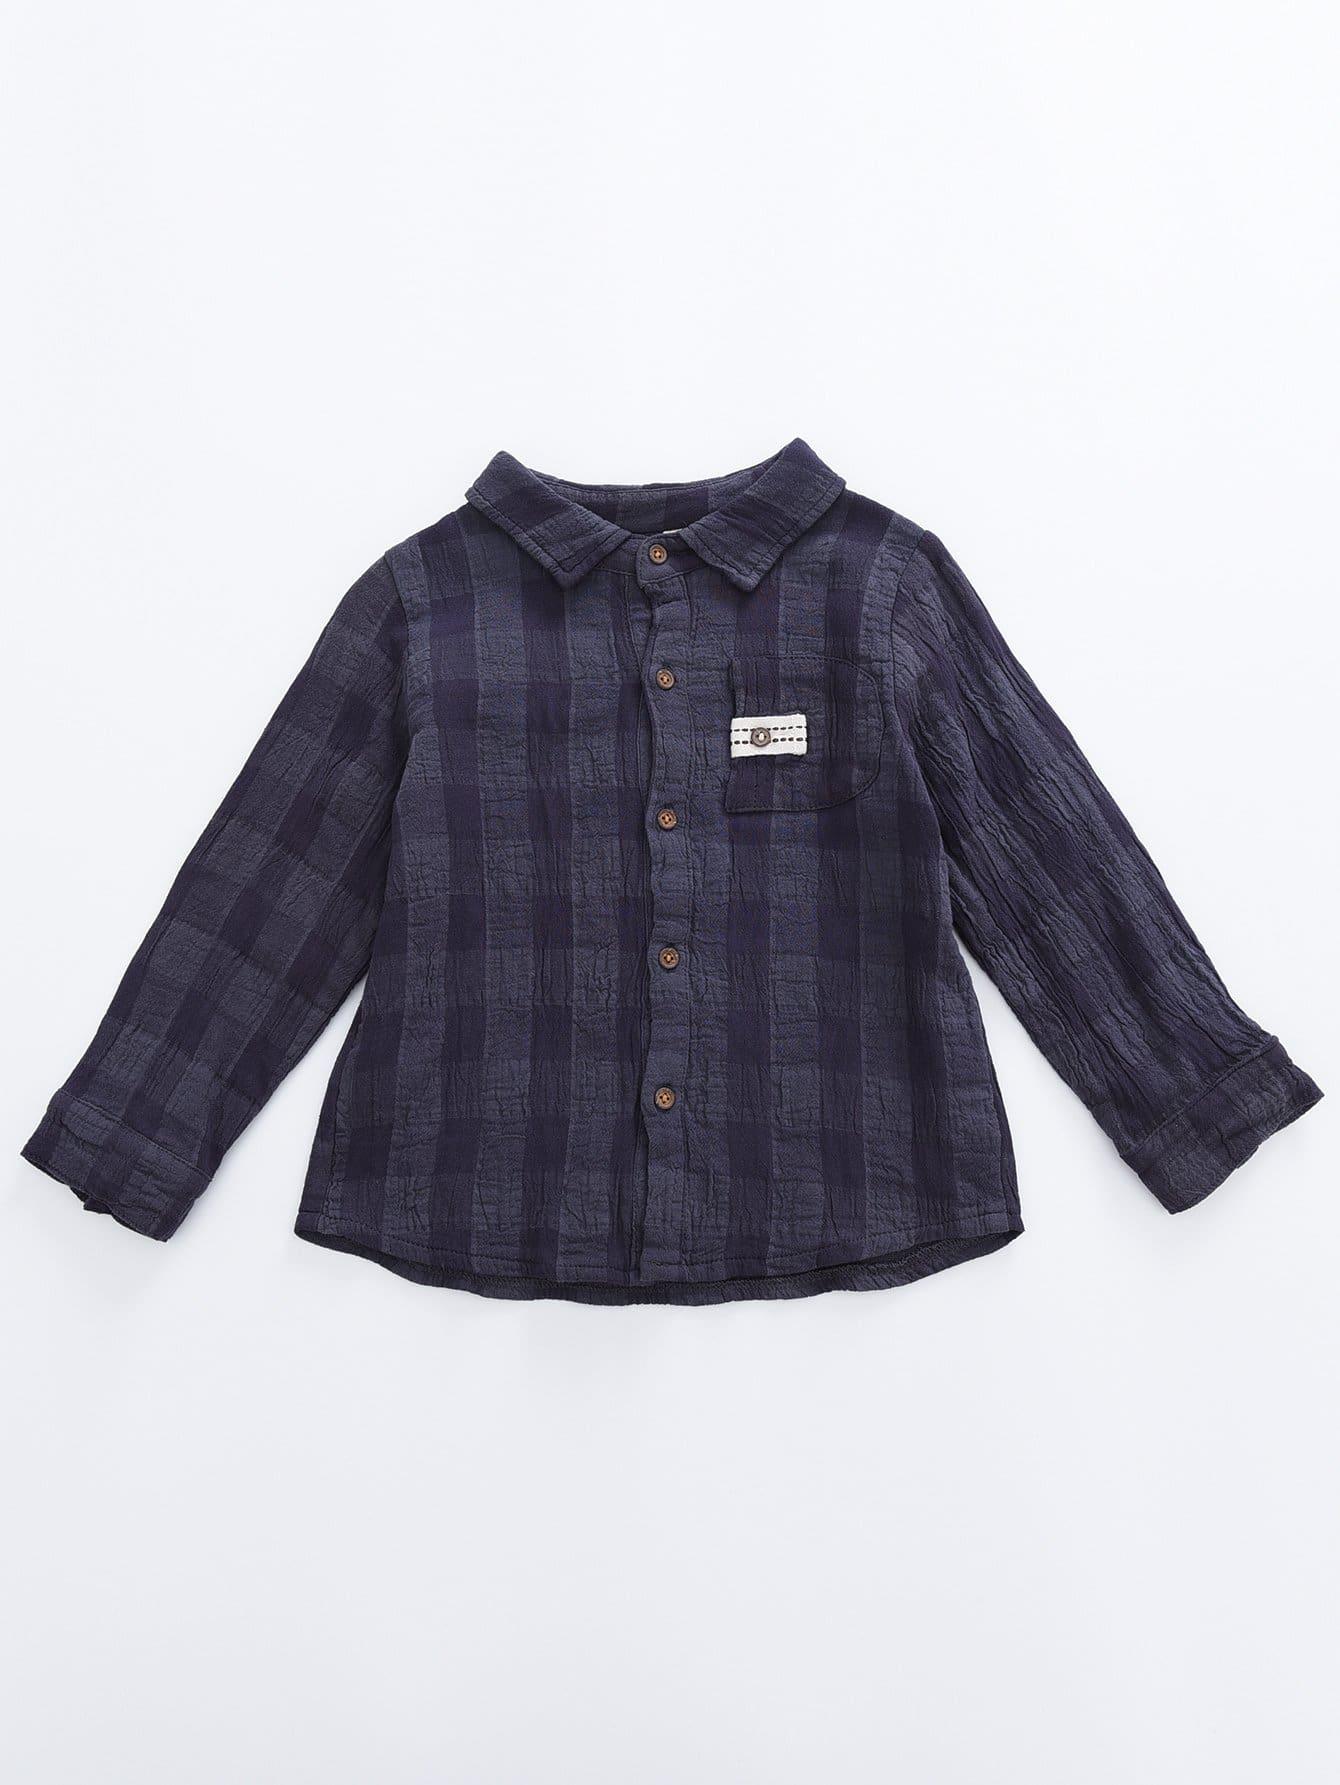 Мальчики С Карманом Клетчатую Рубашку